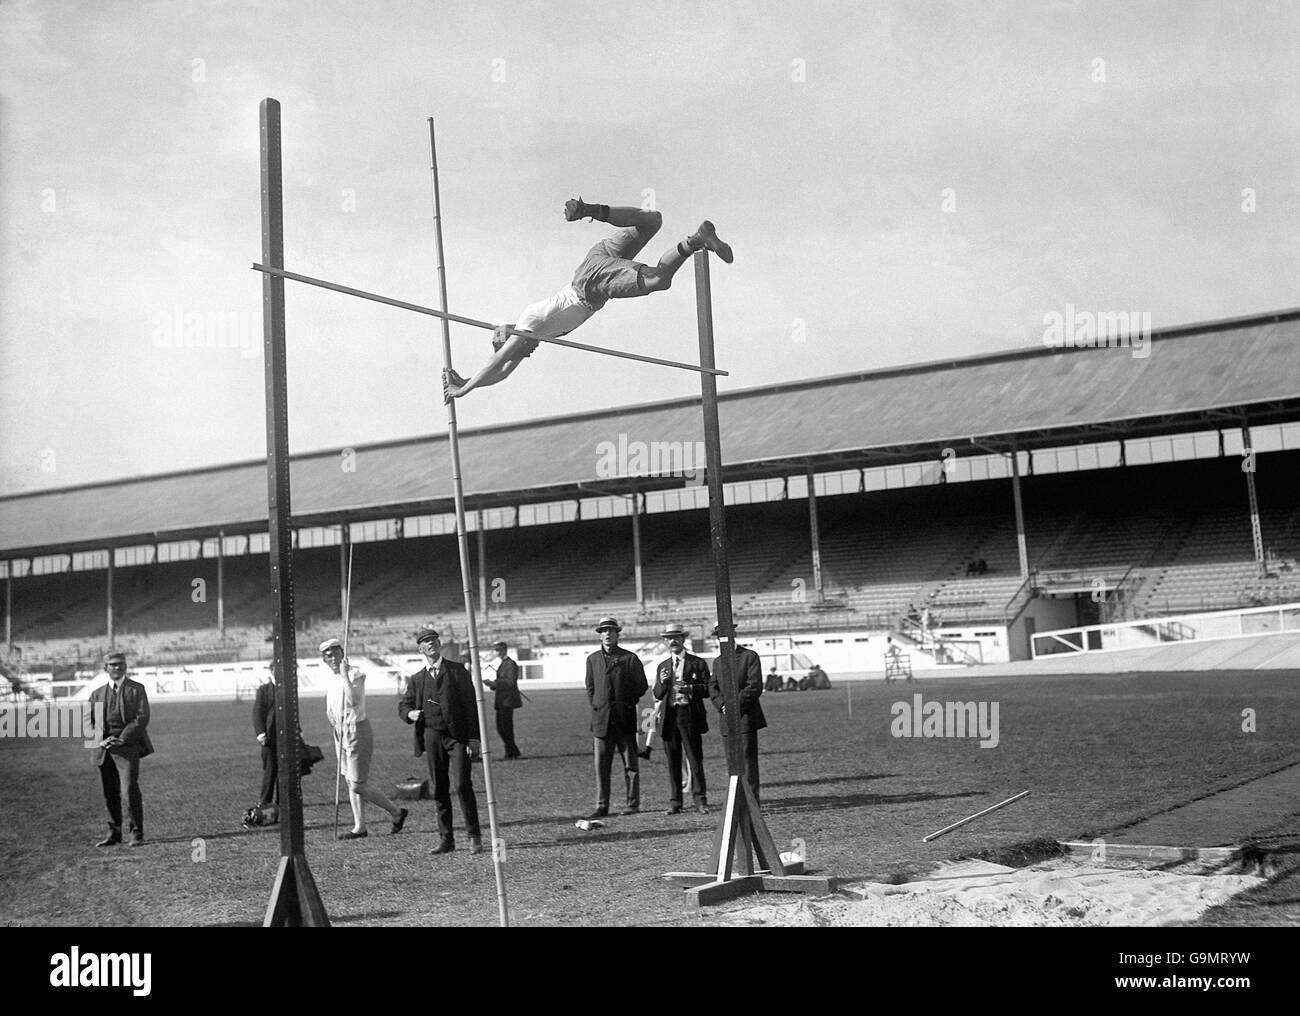 Athletics - London Olympic Games 1908 - Pole Vault - Final - White City Stock Photo